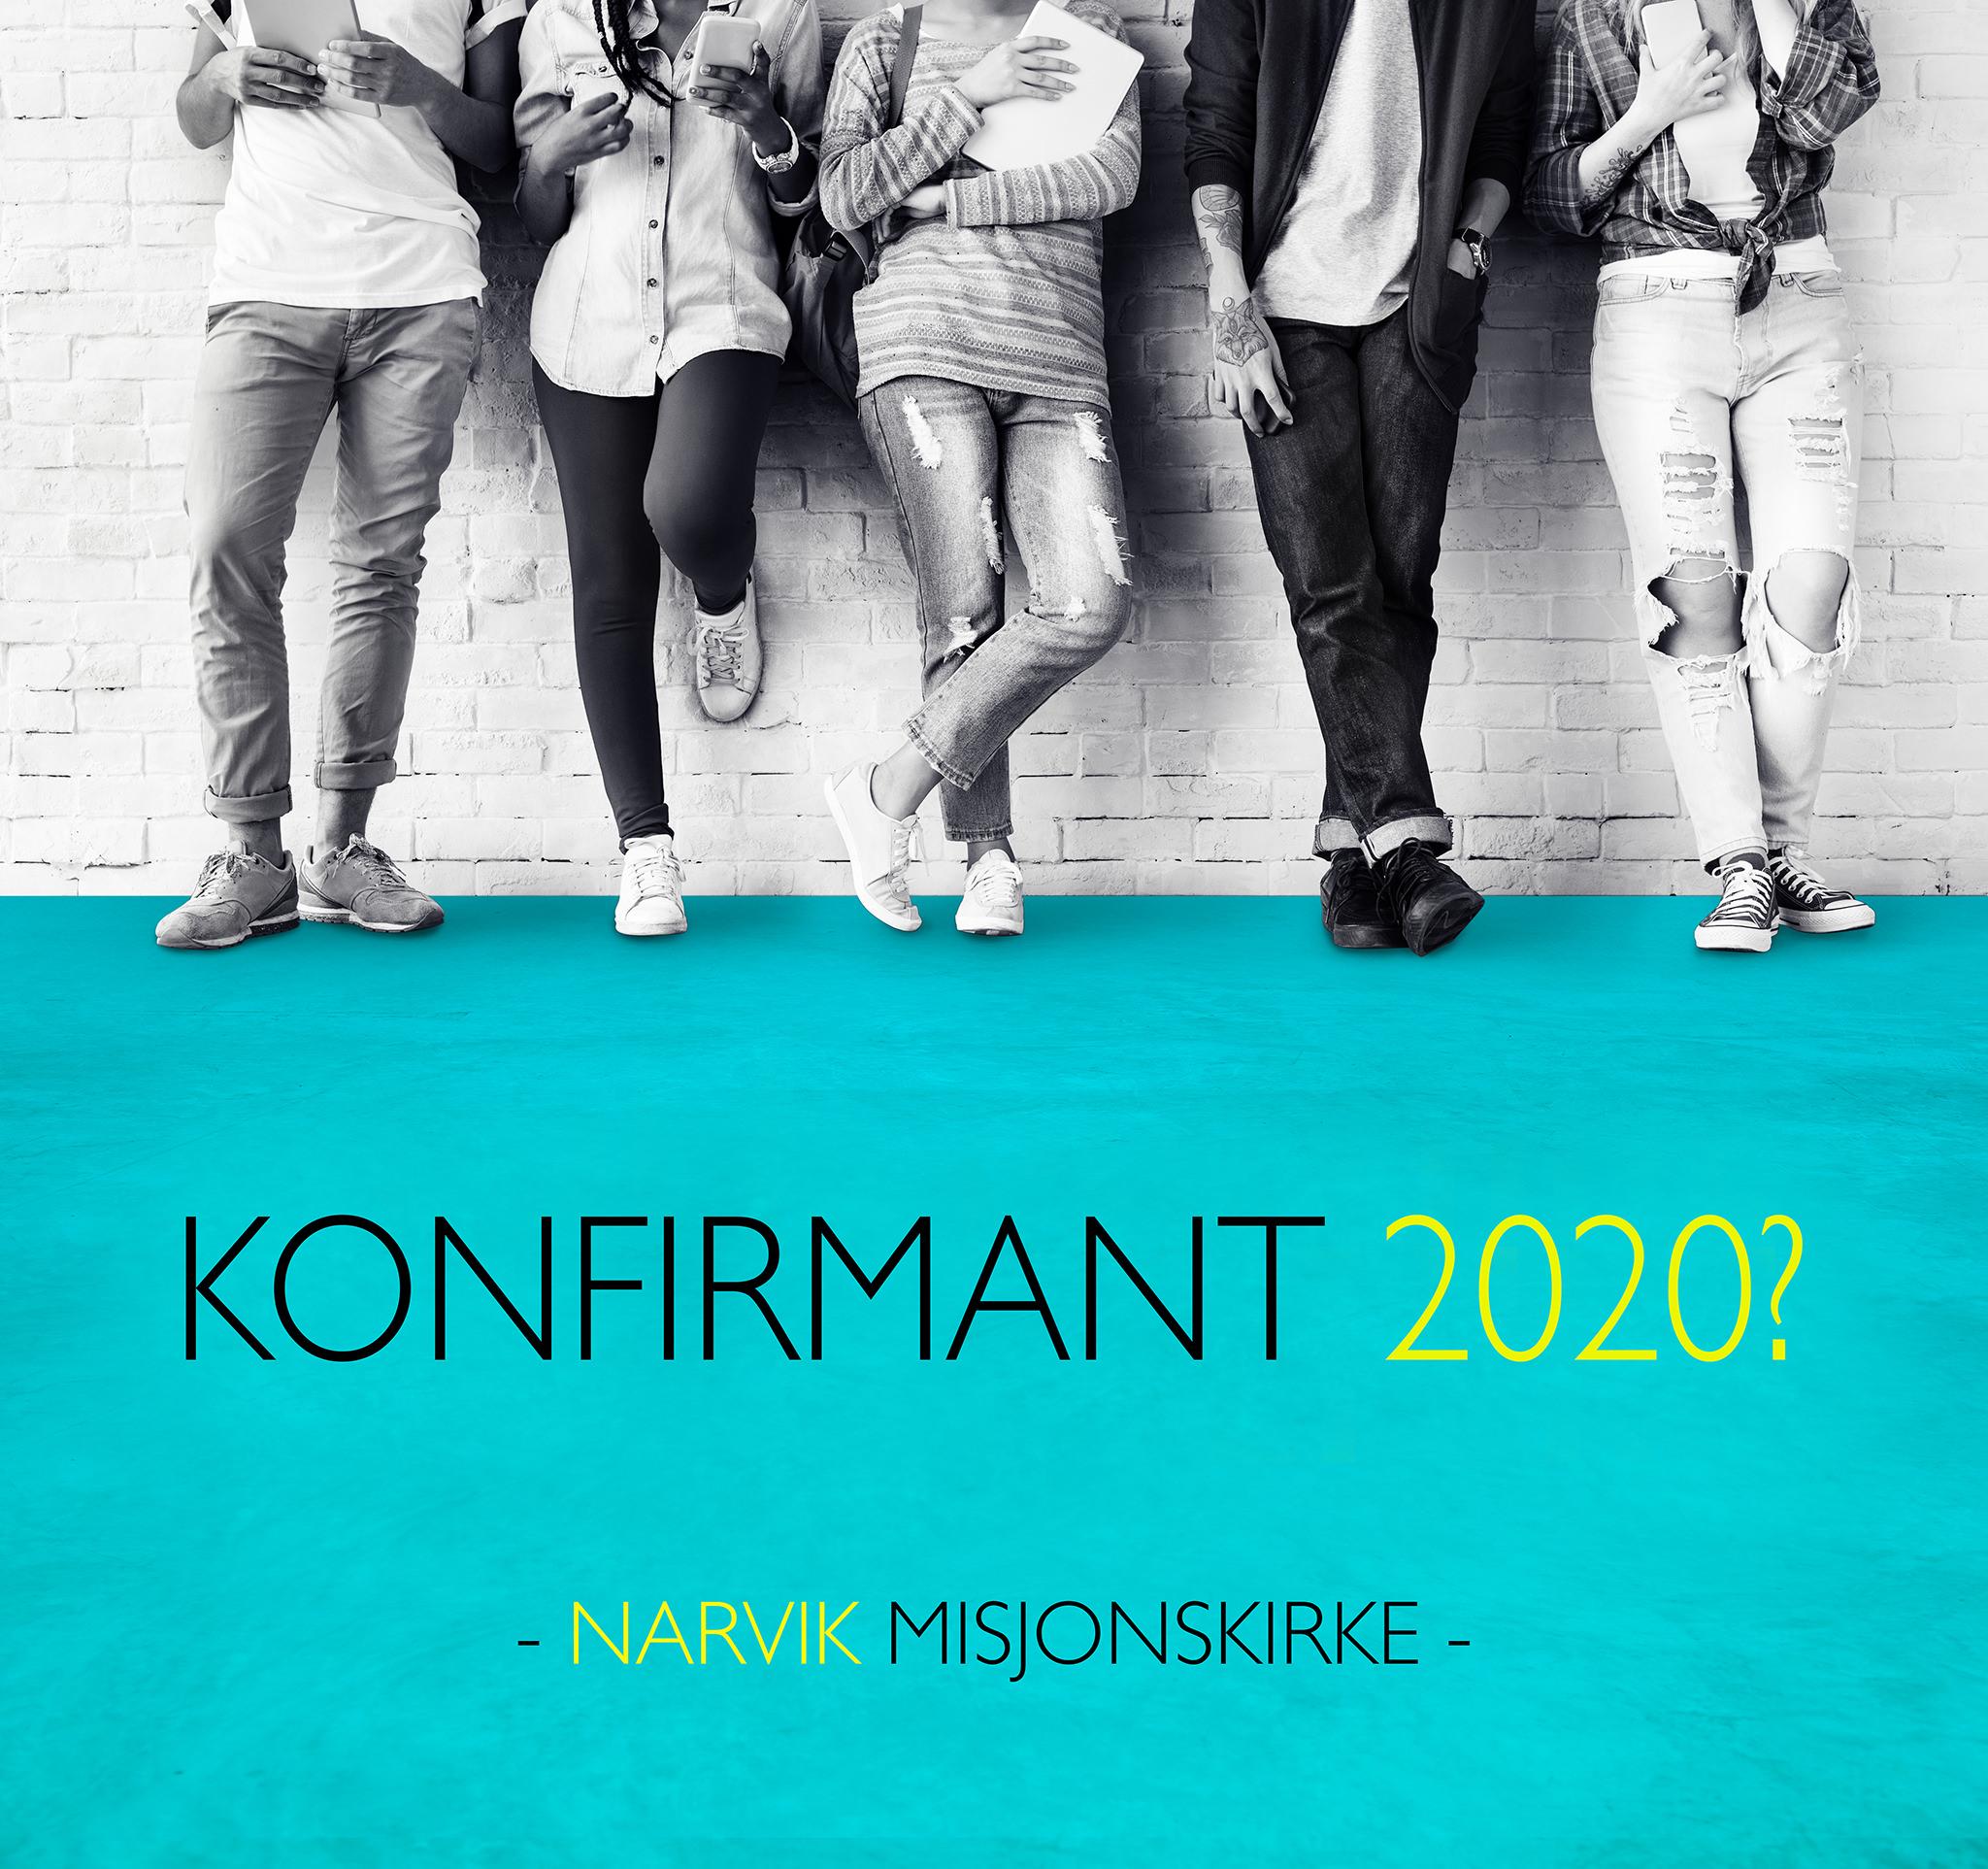 konfirmant 2020_2.jpg